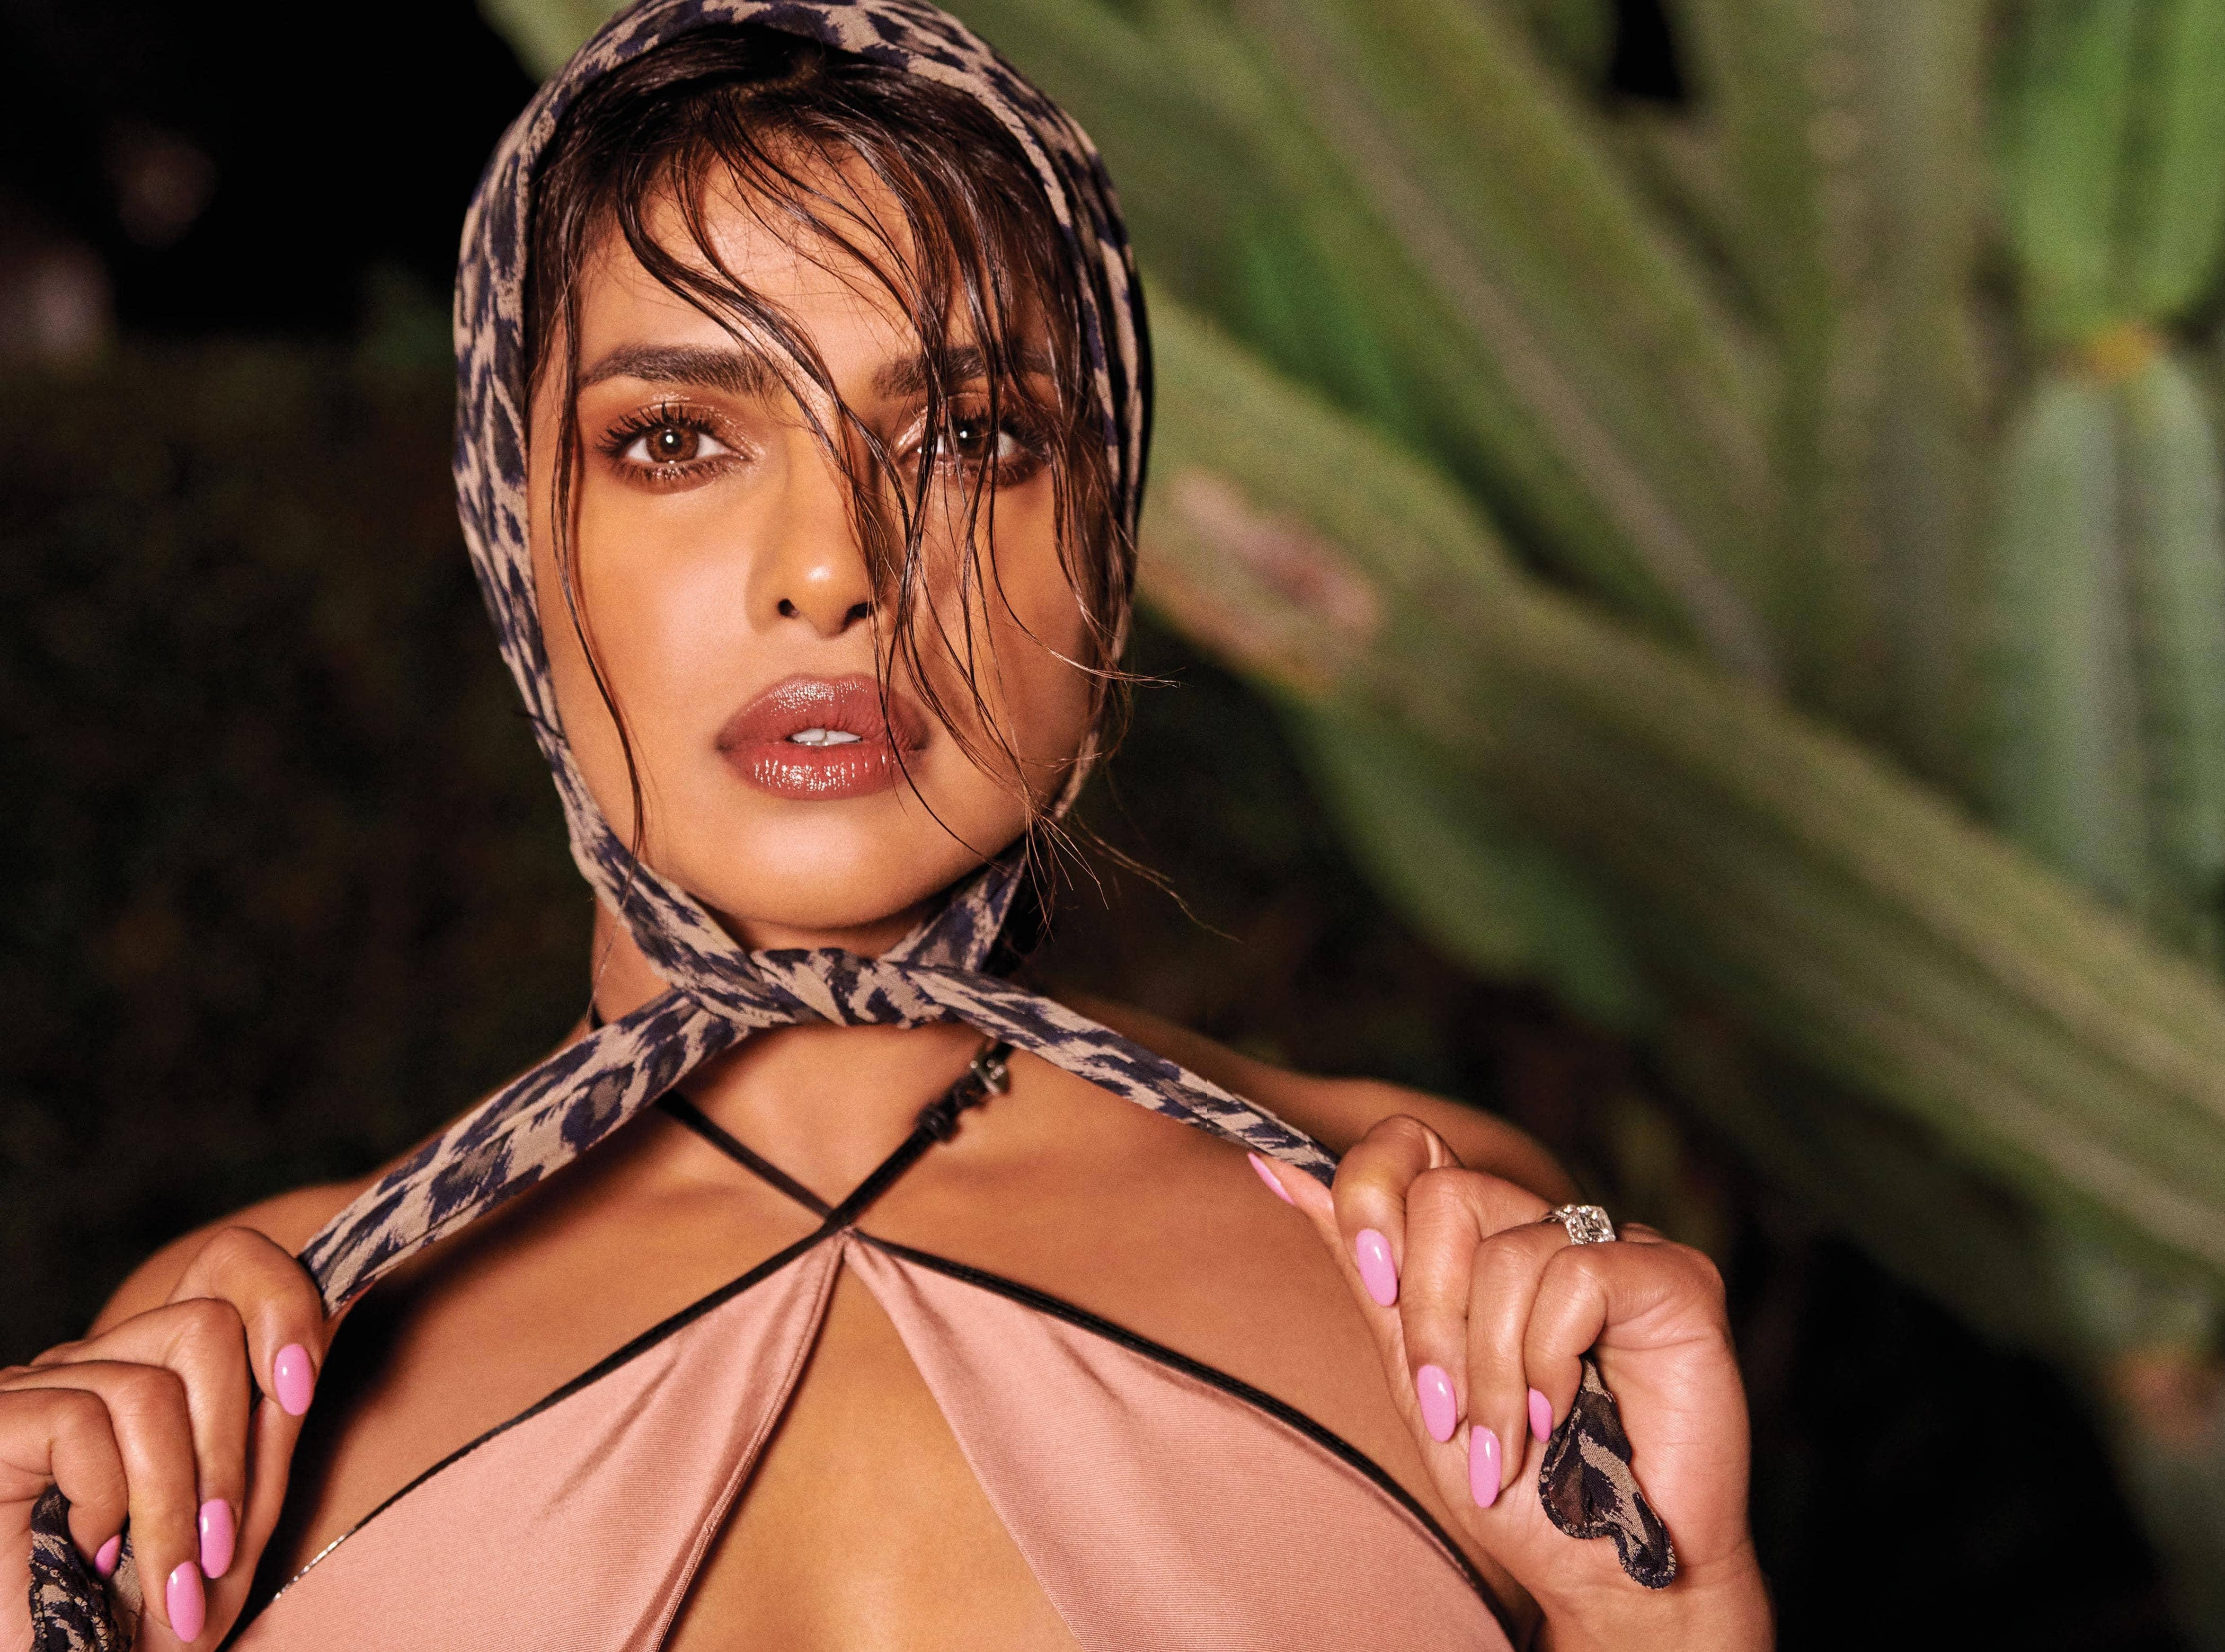 Priyanka Chopra Jonas On Sample Size, Inclusivity And Loving Her Flaws